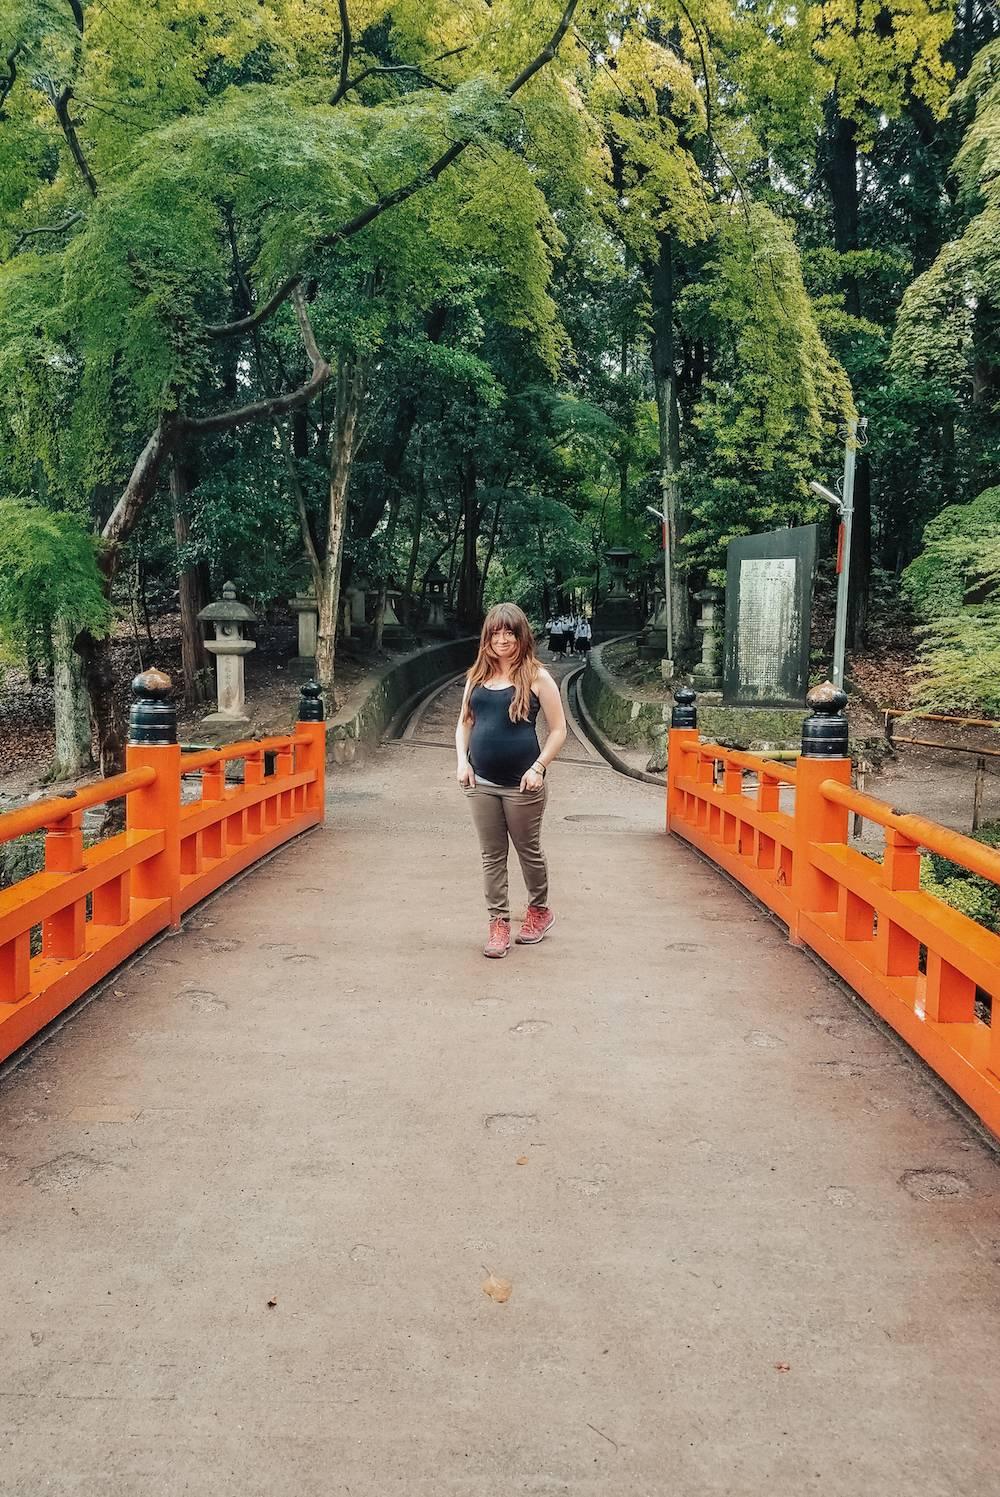 Memoirs of a Geisha Fushimi Inari Taisha 伏見稲荷大社_2